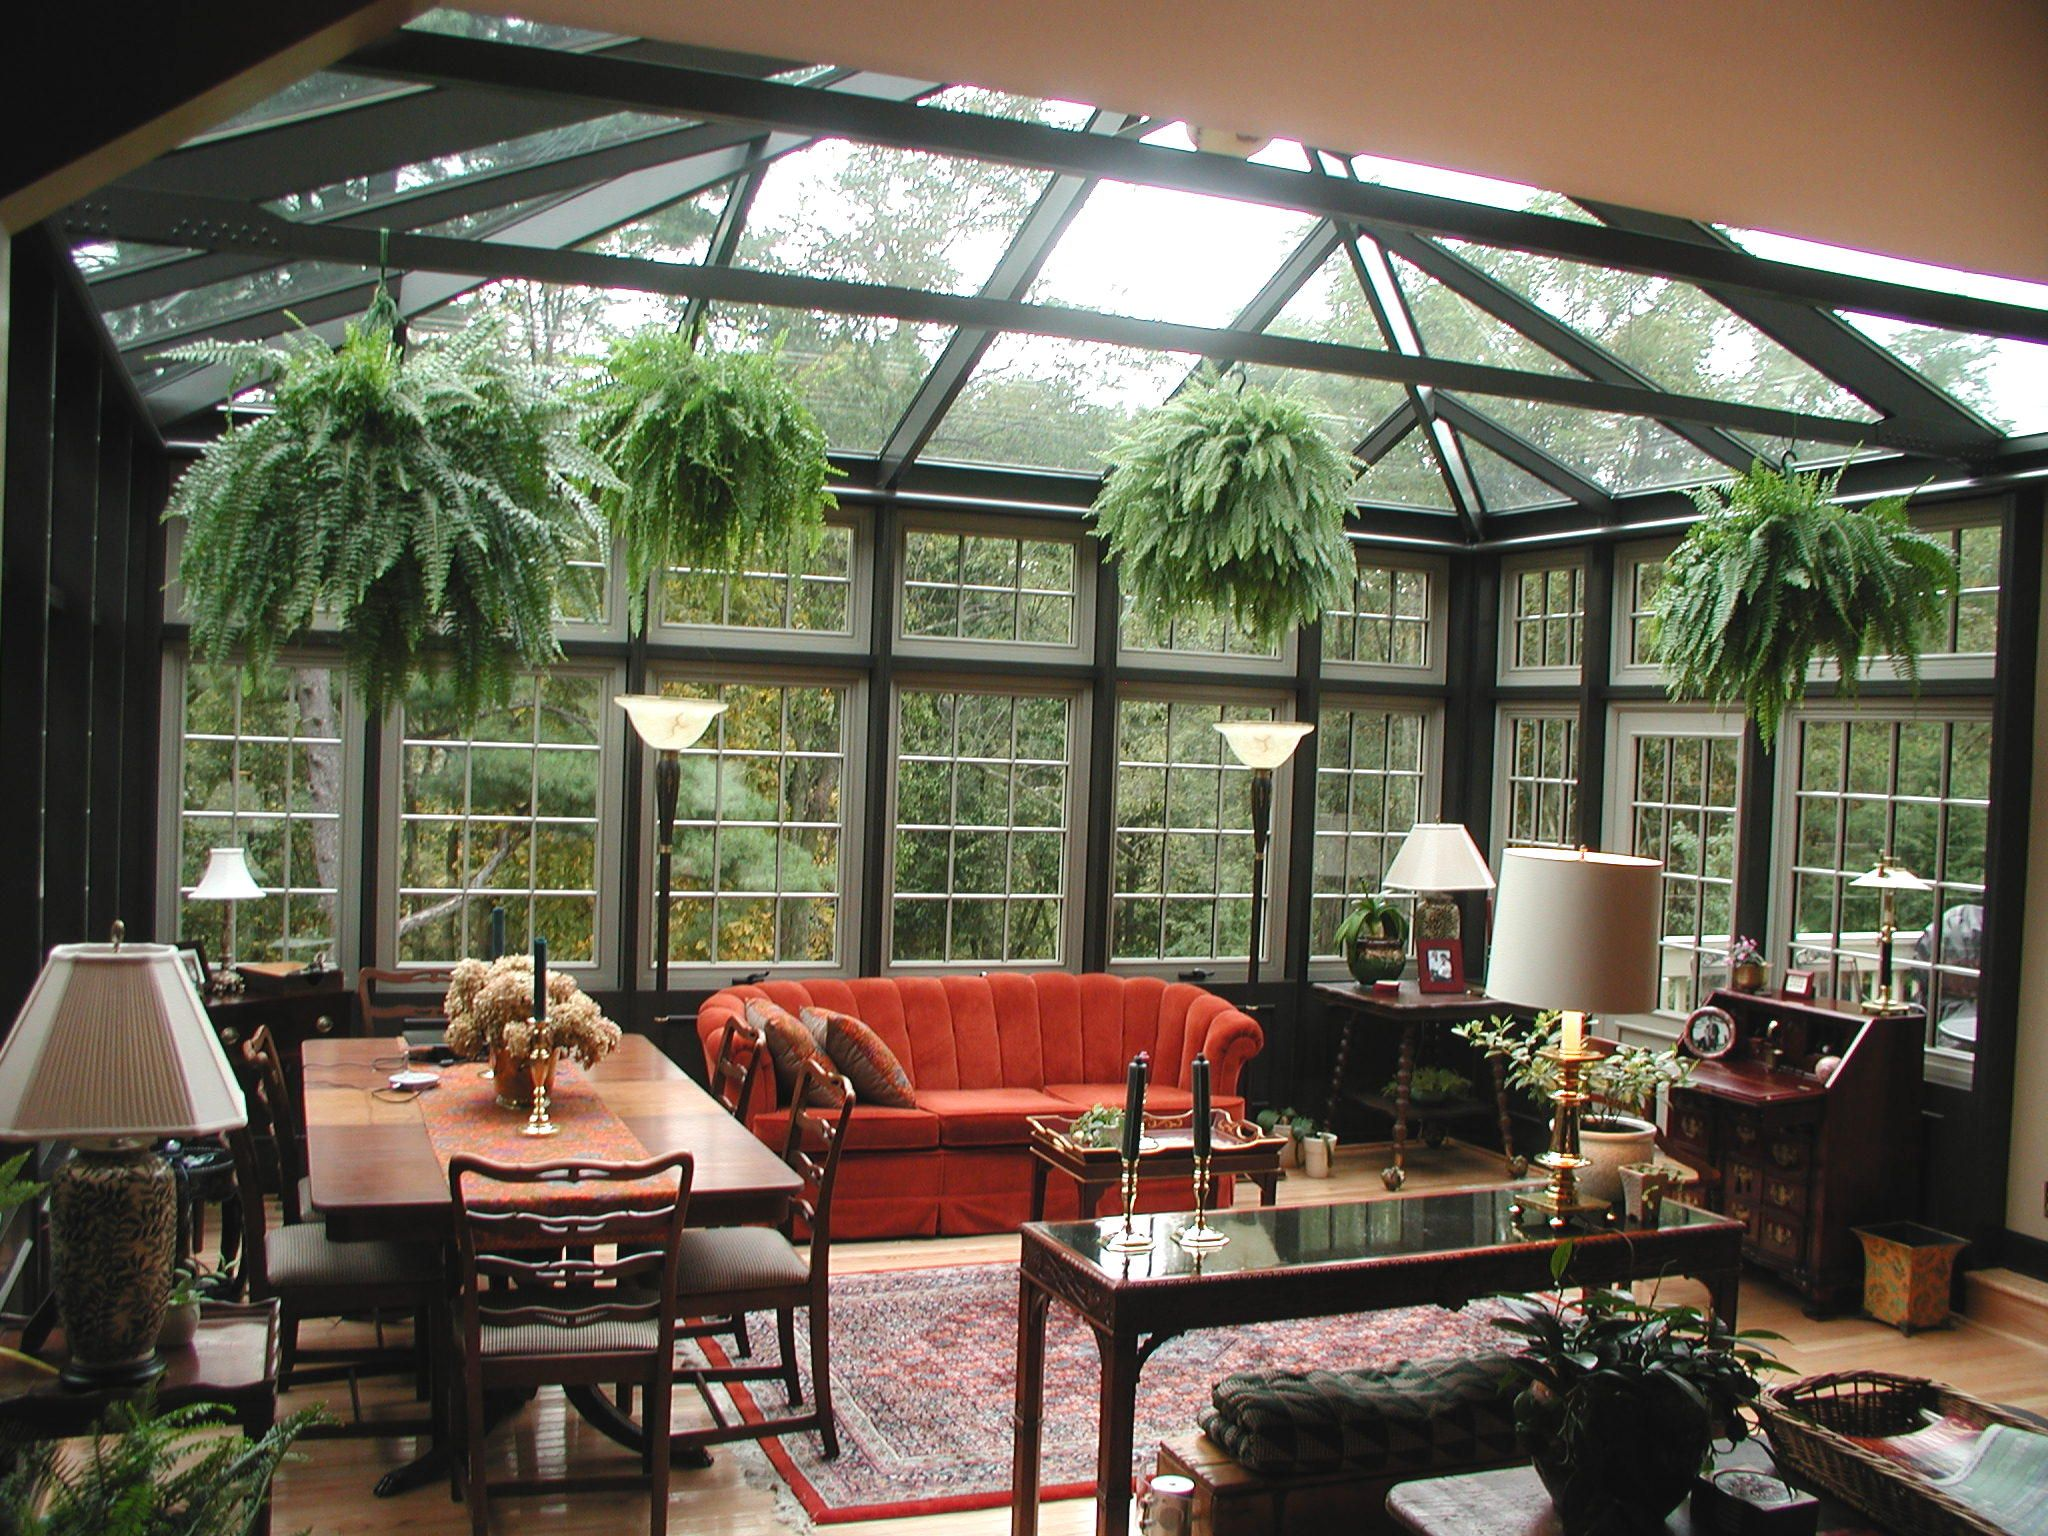 Aménagez votre véranda en jardin d\'hiver | Wintergärten, Einrichtung ...